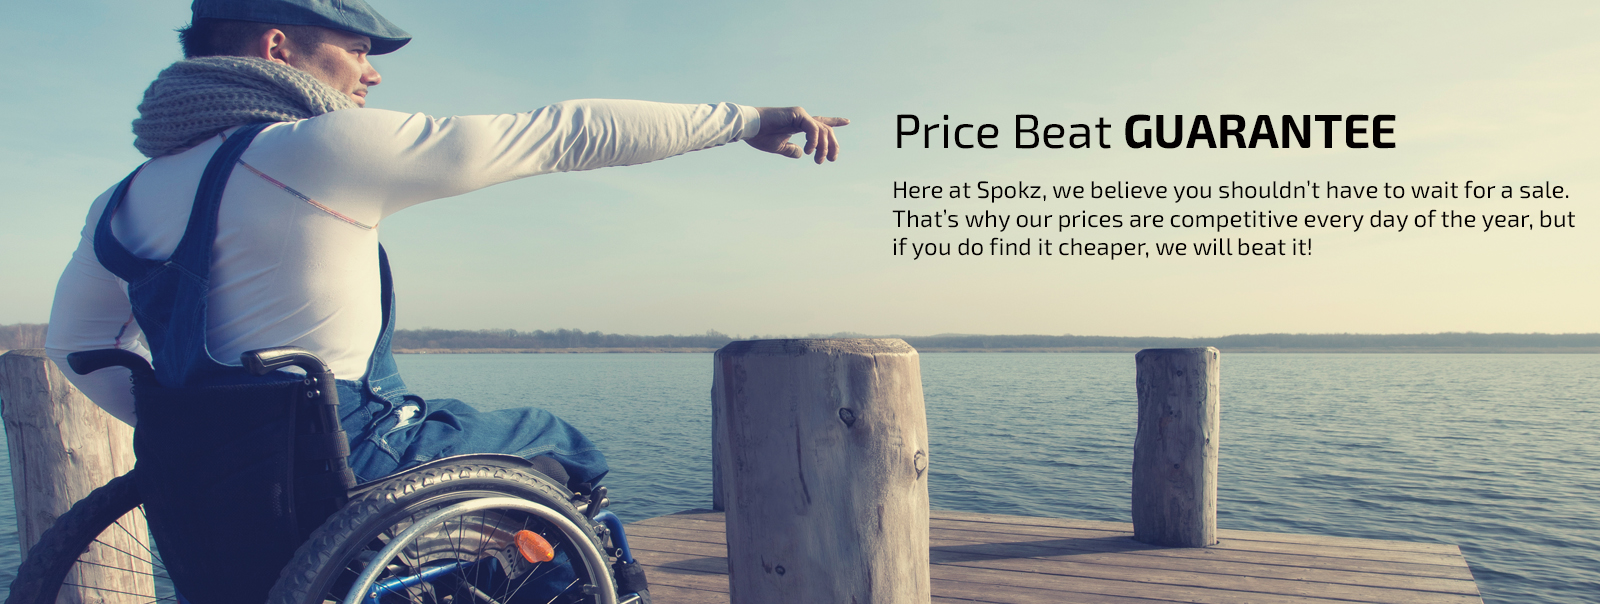 Wheelchair user racing